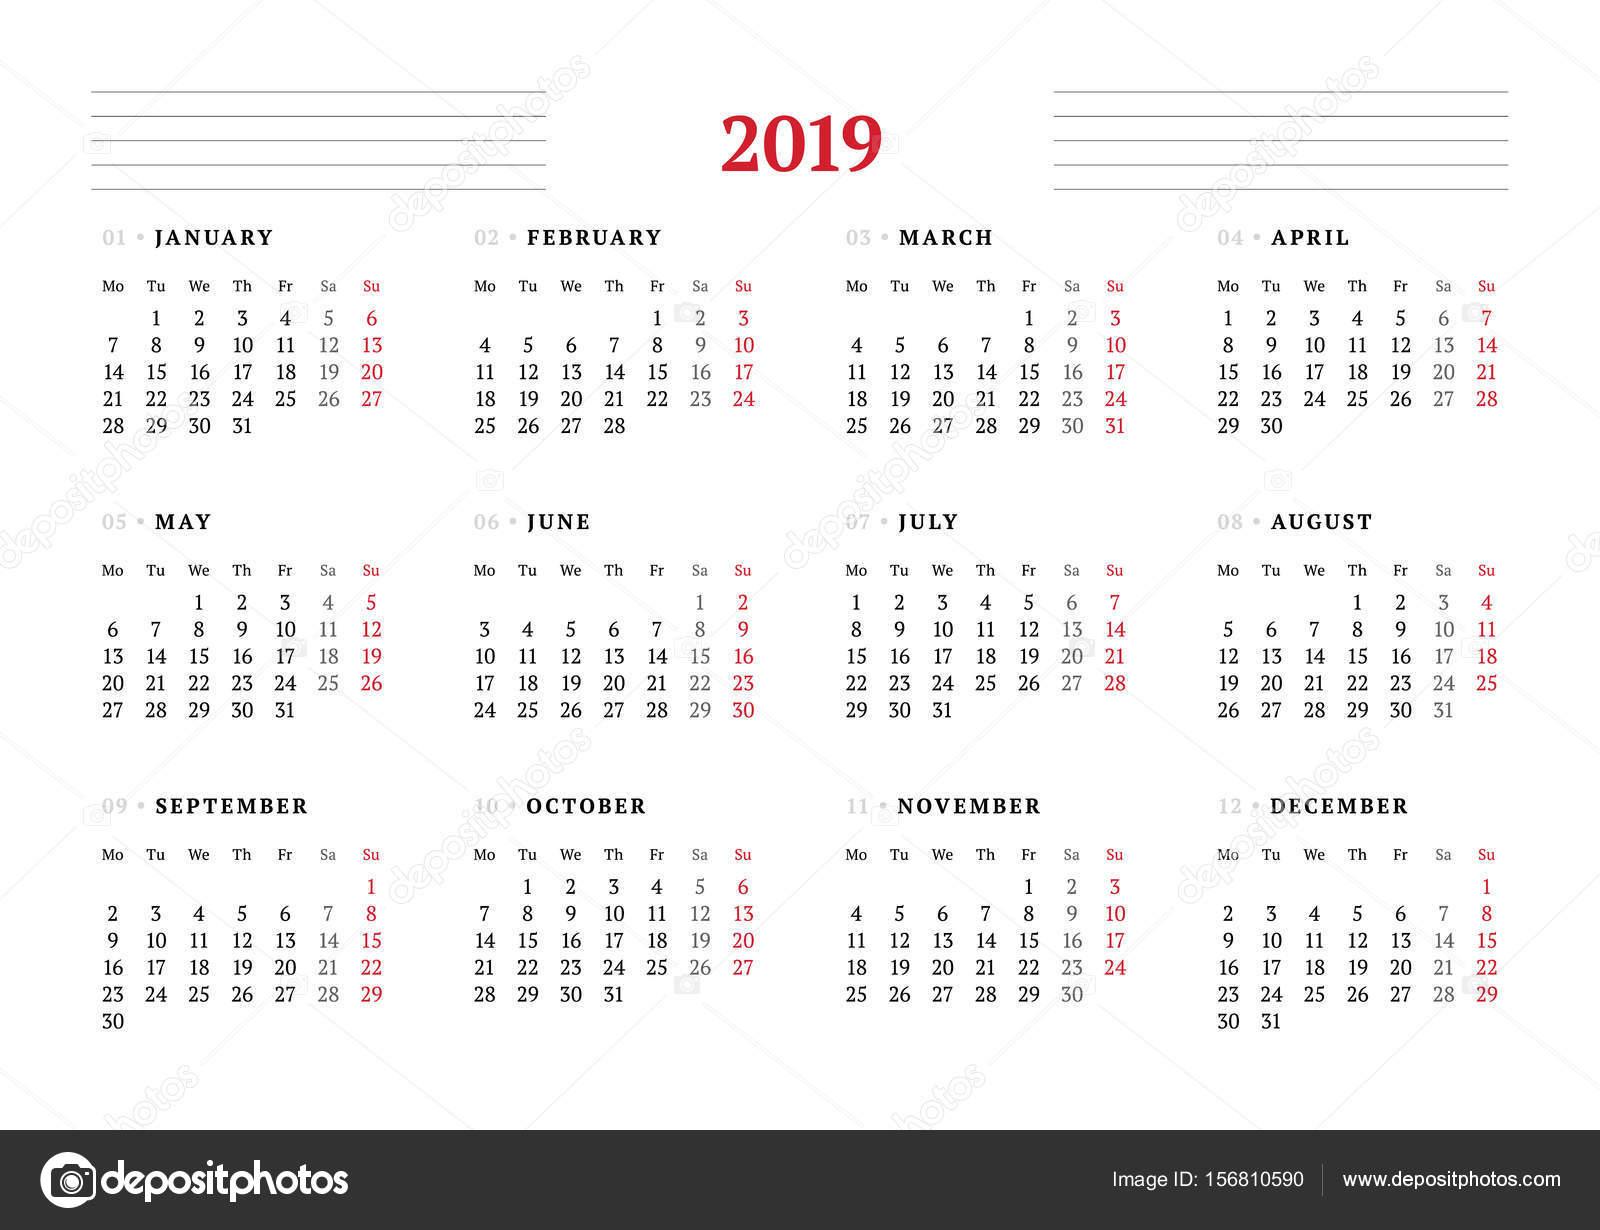 2019 március naptár Naptár 2019 évre fehér háttér. Vector design nyomtatási sablon  2019 március naptár